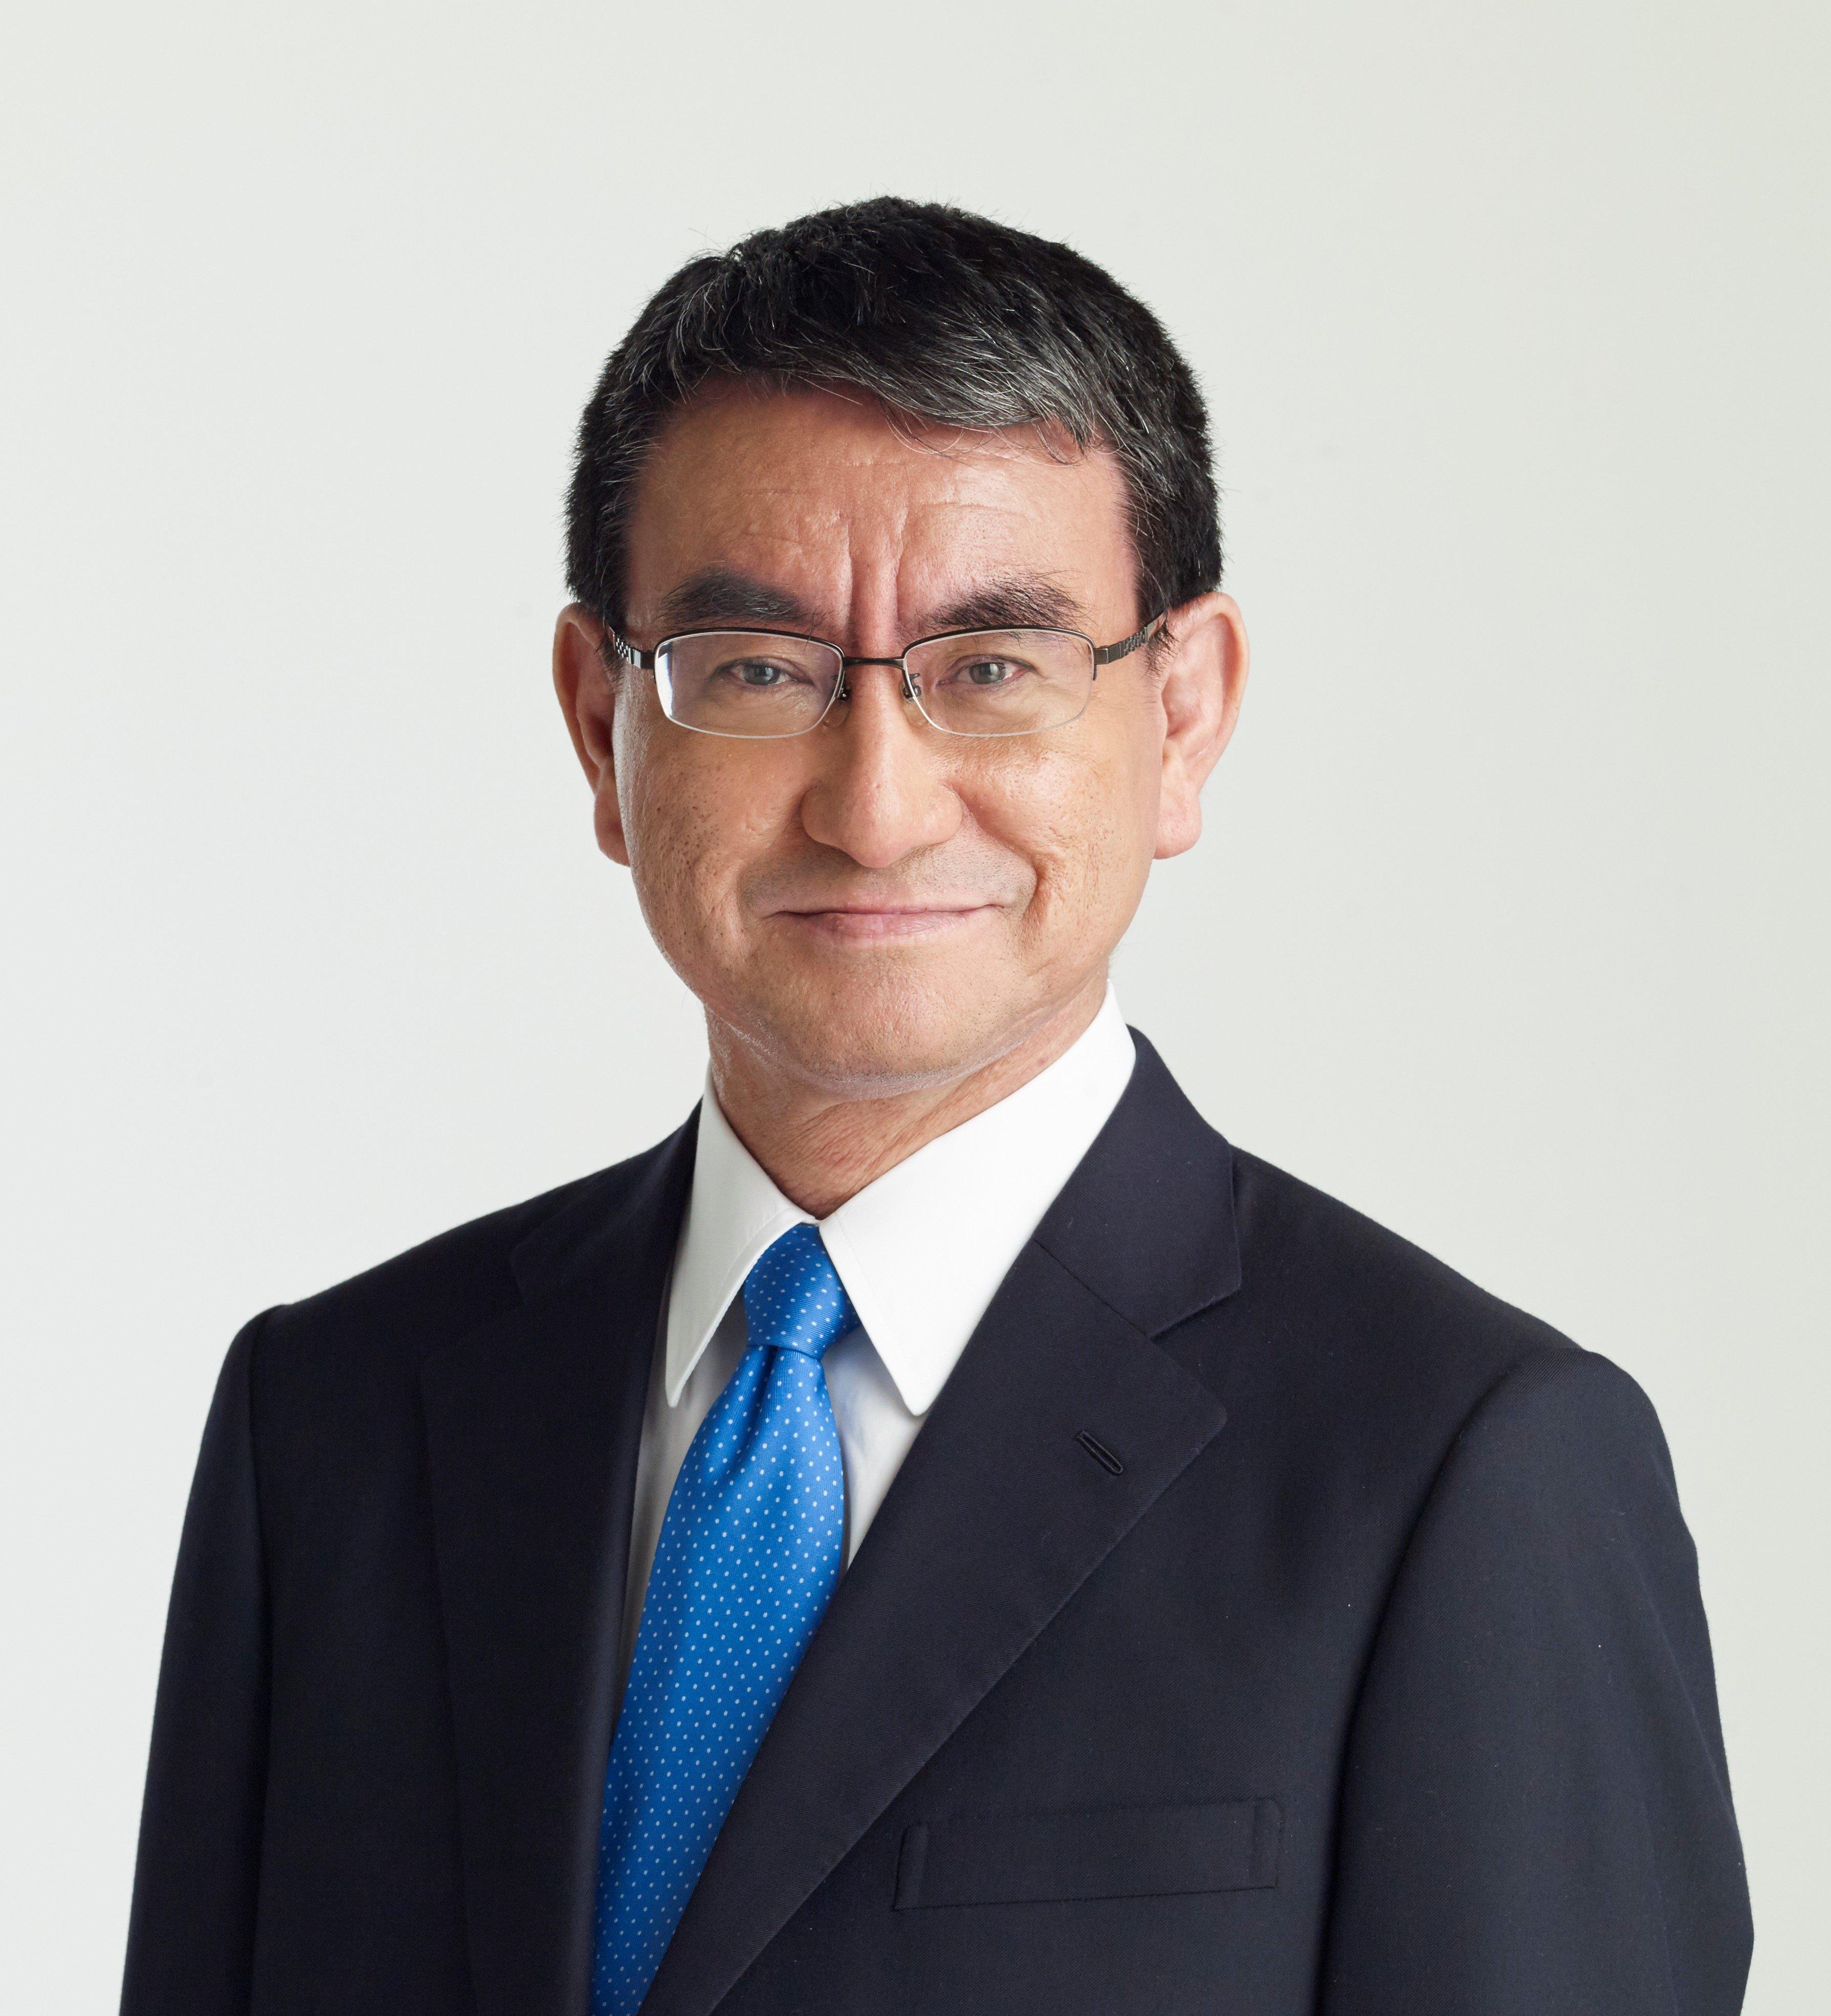 Portrait of Taro Kono, Japanese Minister of Defense